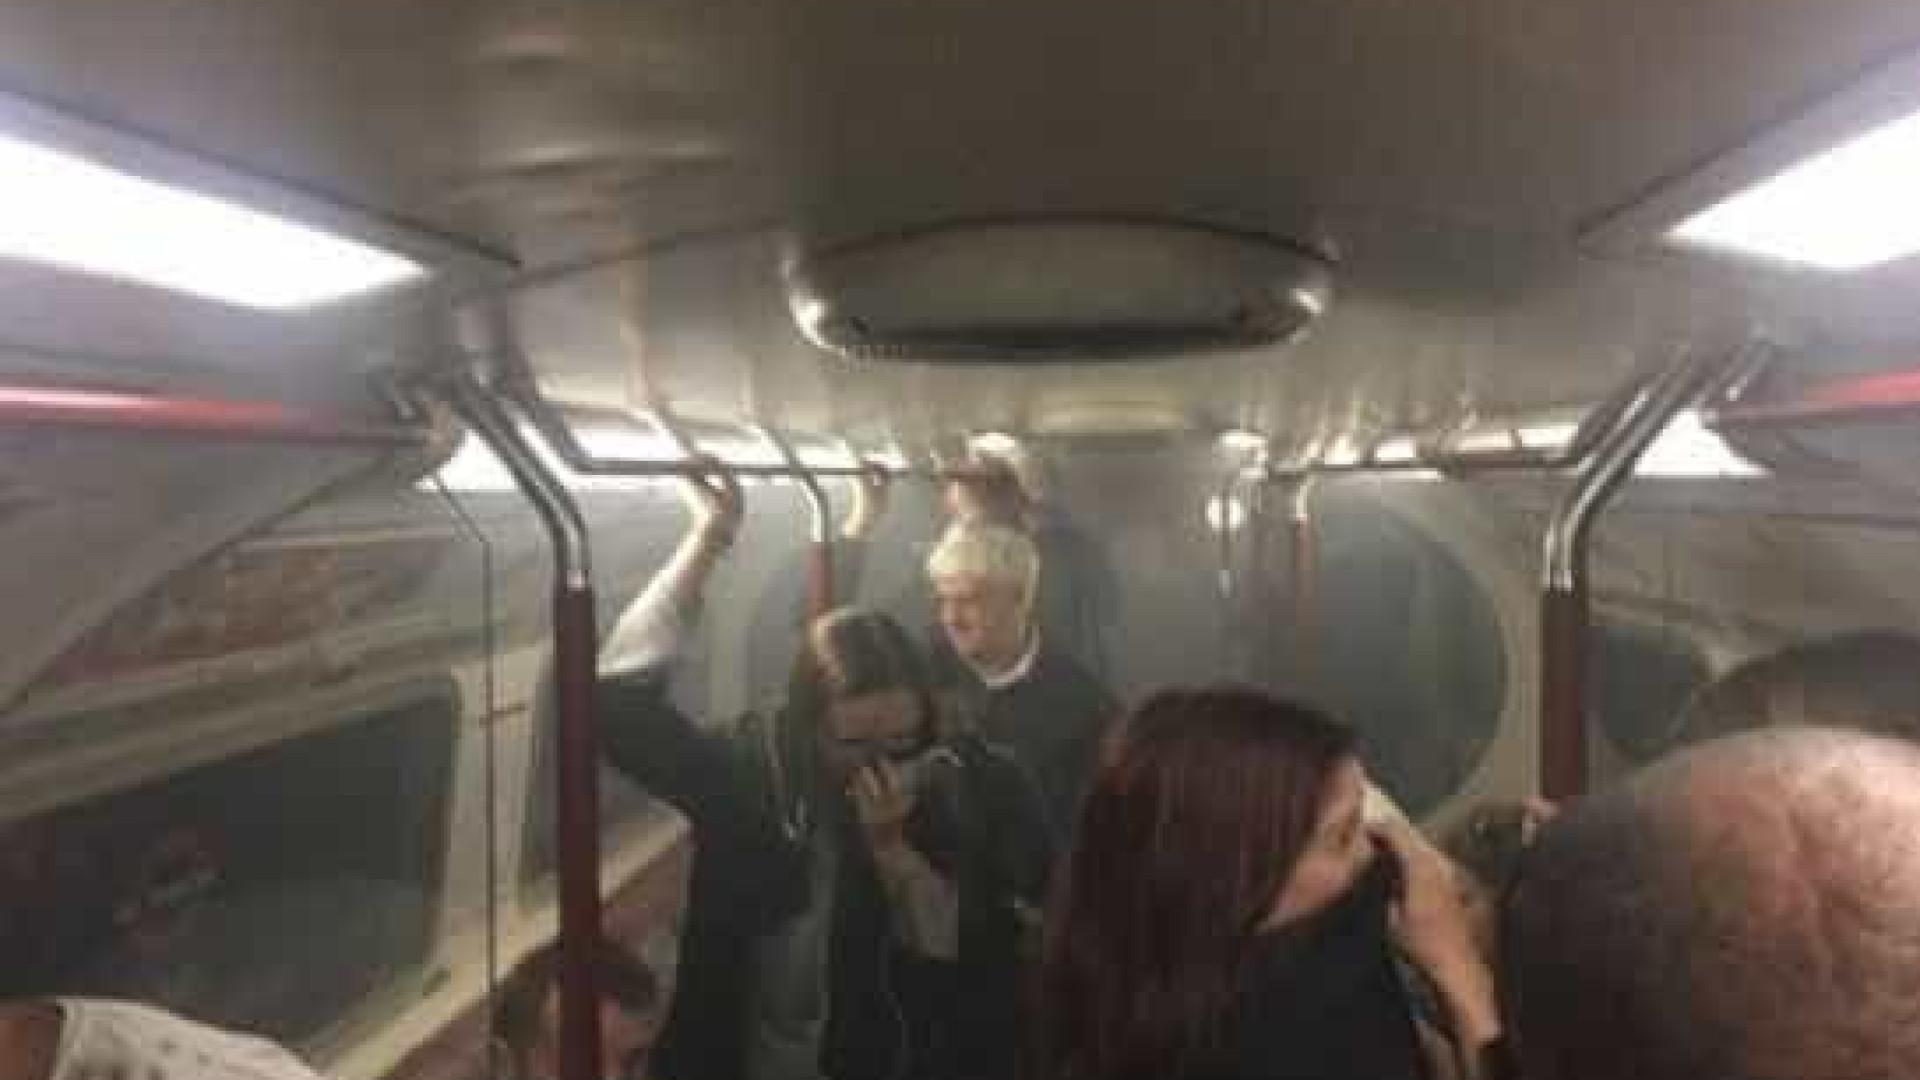 Vídeo: Metro de Londres evacuado por causa de incêndio